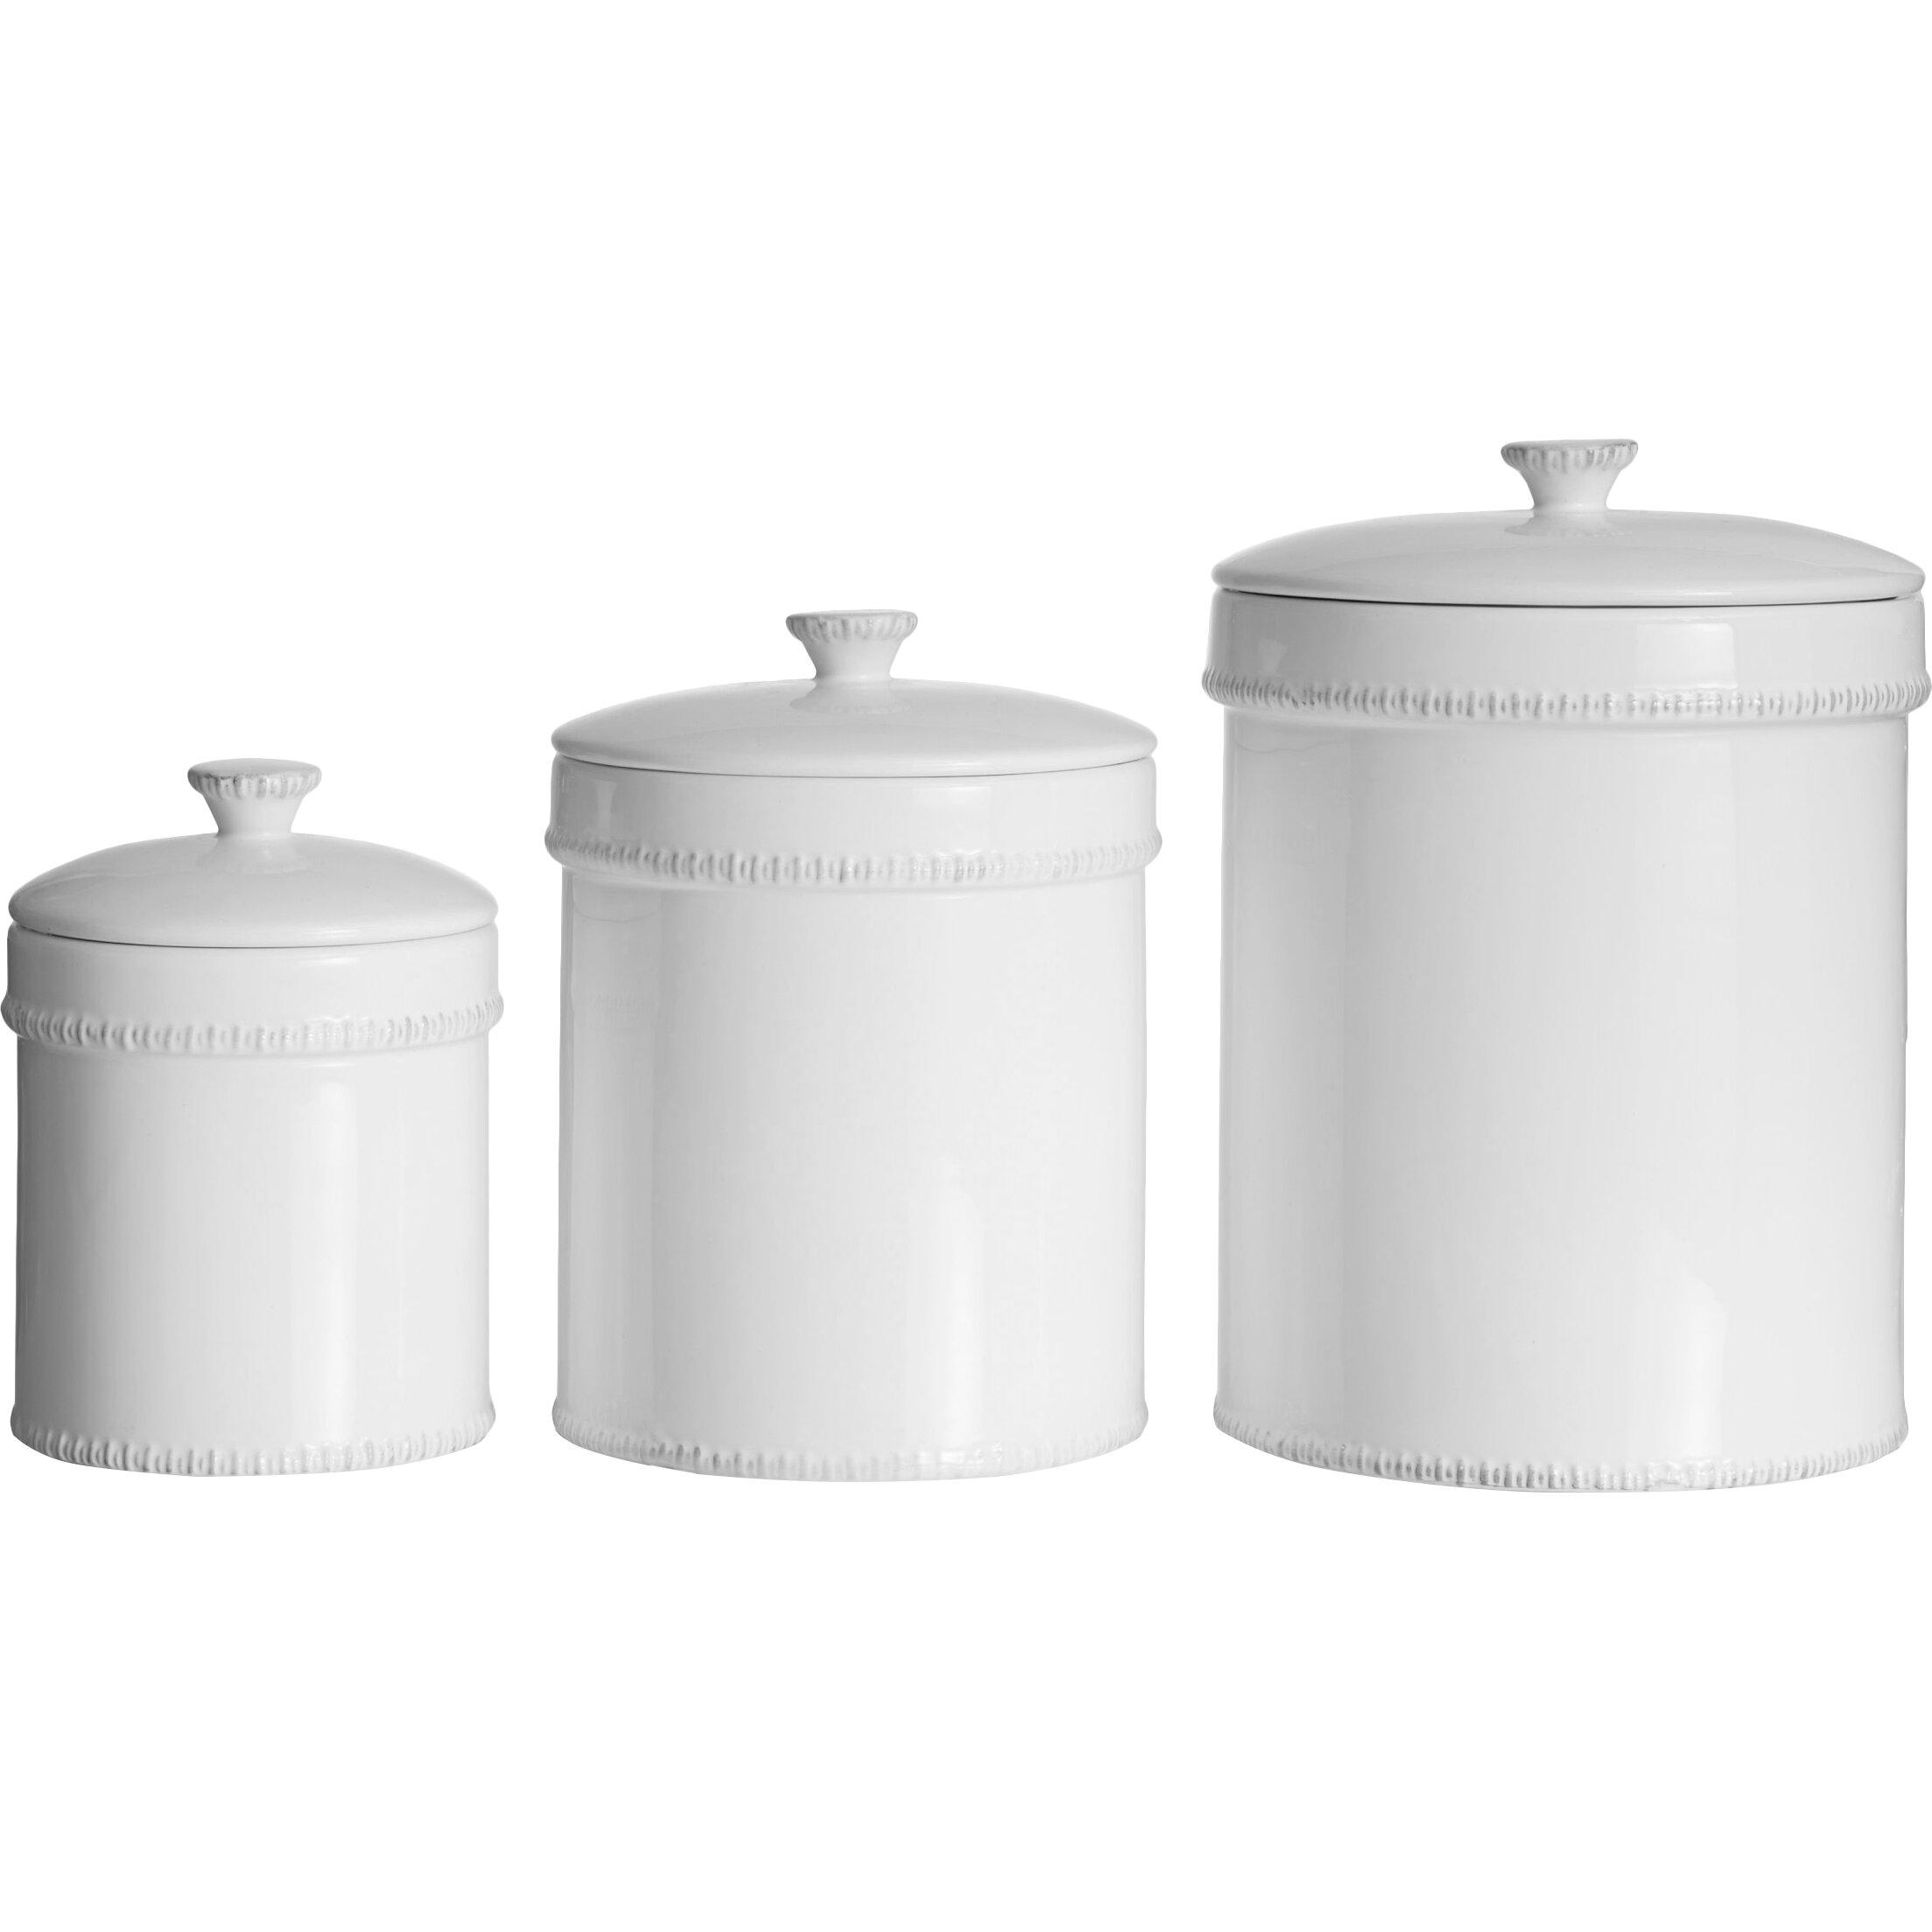 Modern Kitchen Canister Sets Design Guild Bianca 3 Piece Kitchen Canister Set Reviews Wayfair